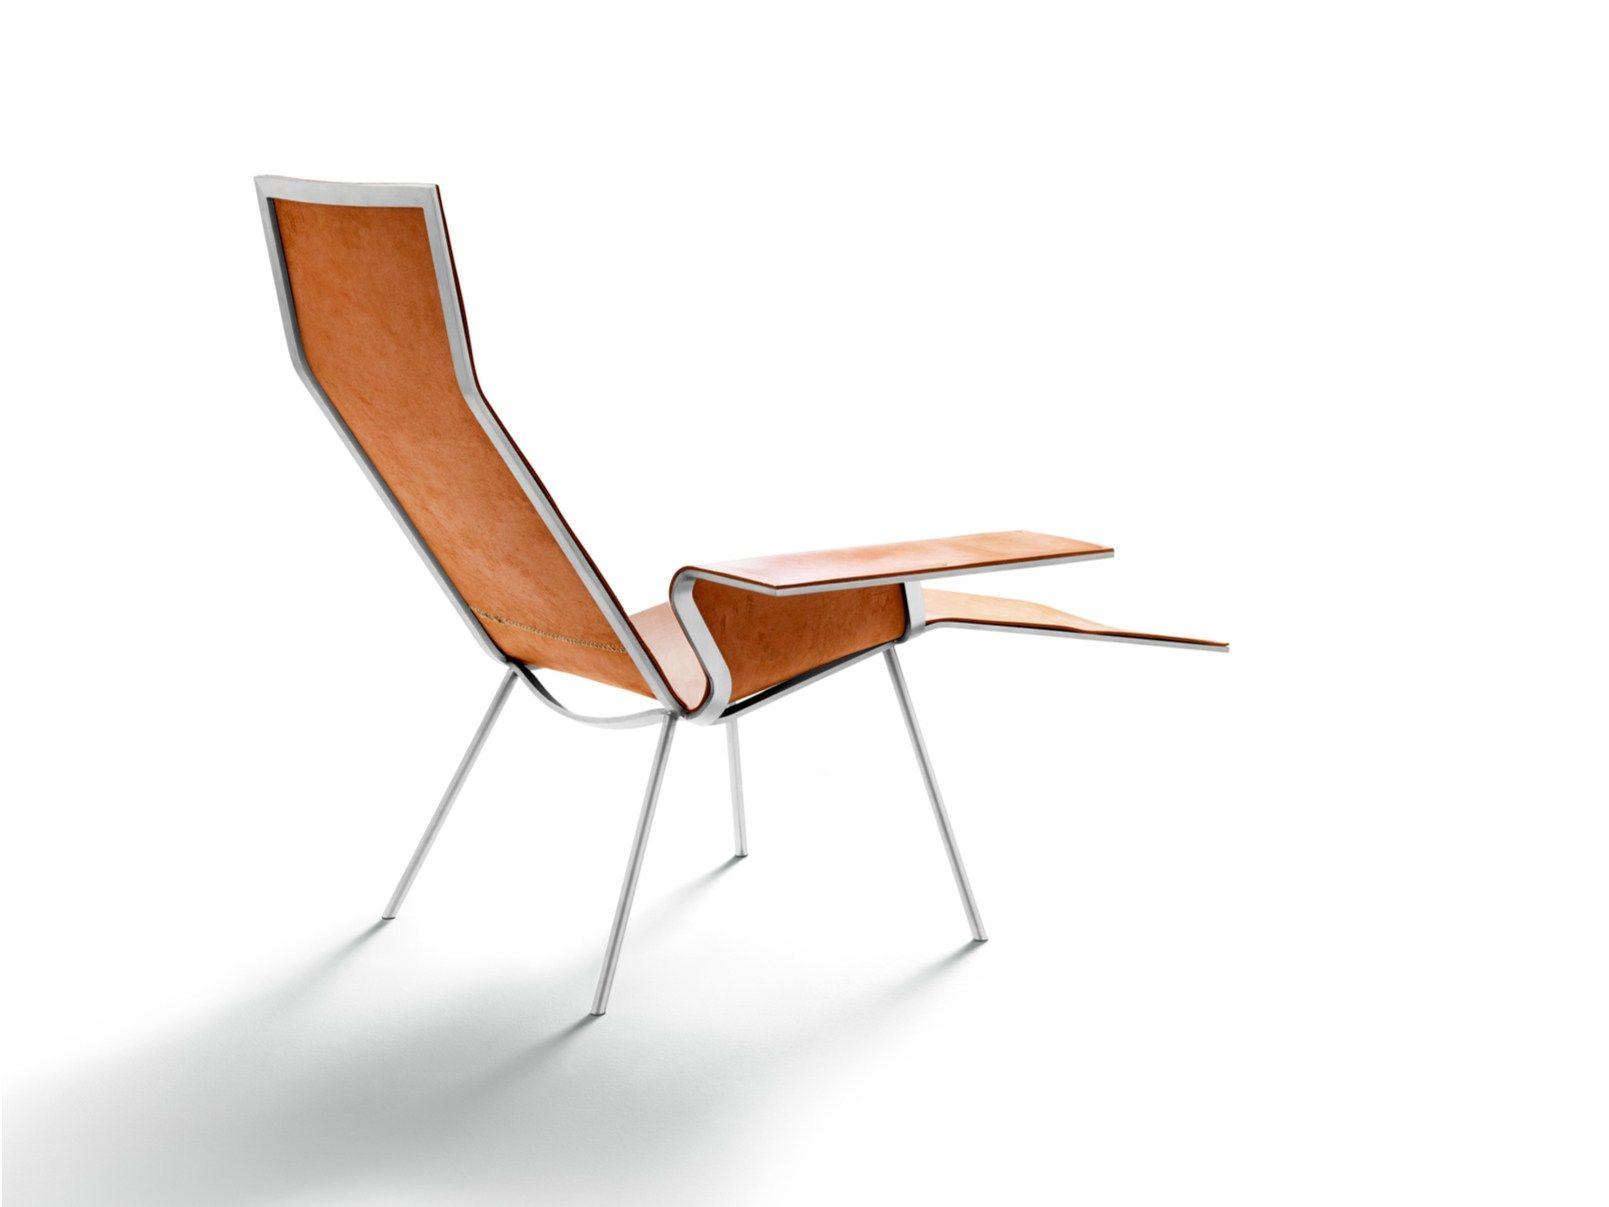 chaiselongue aus gegerbtem leder ll04 by de padova design. Black Bedroom Furniture Sets. Home Design Ideas